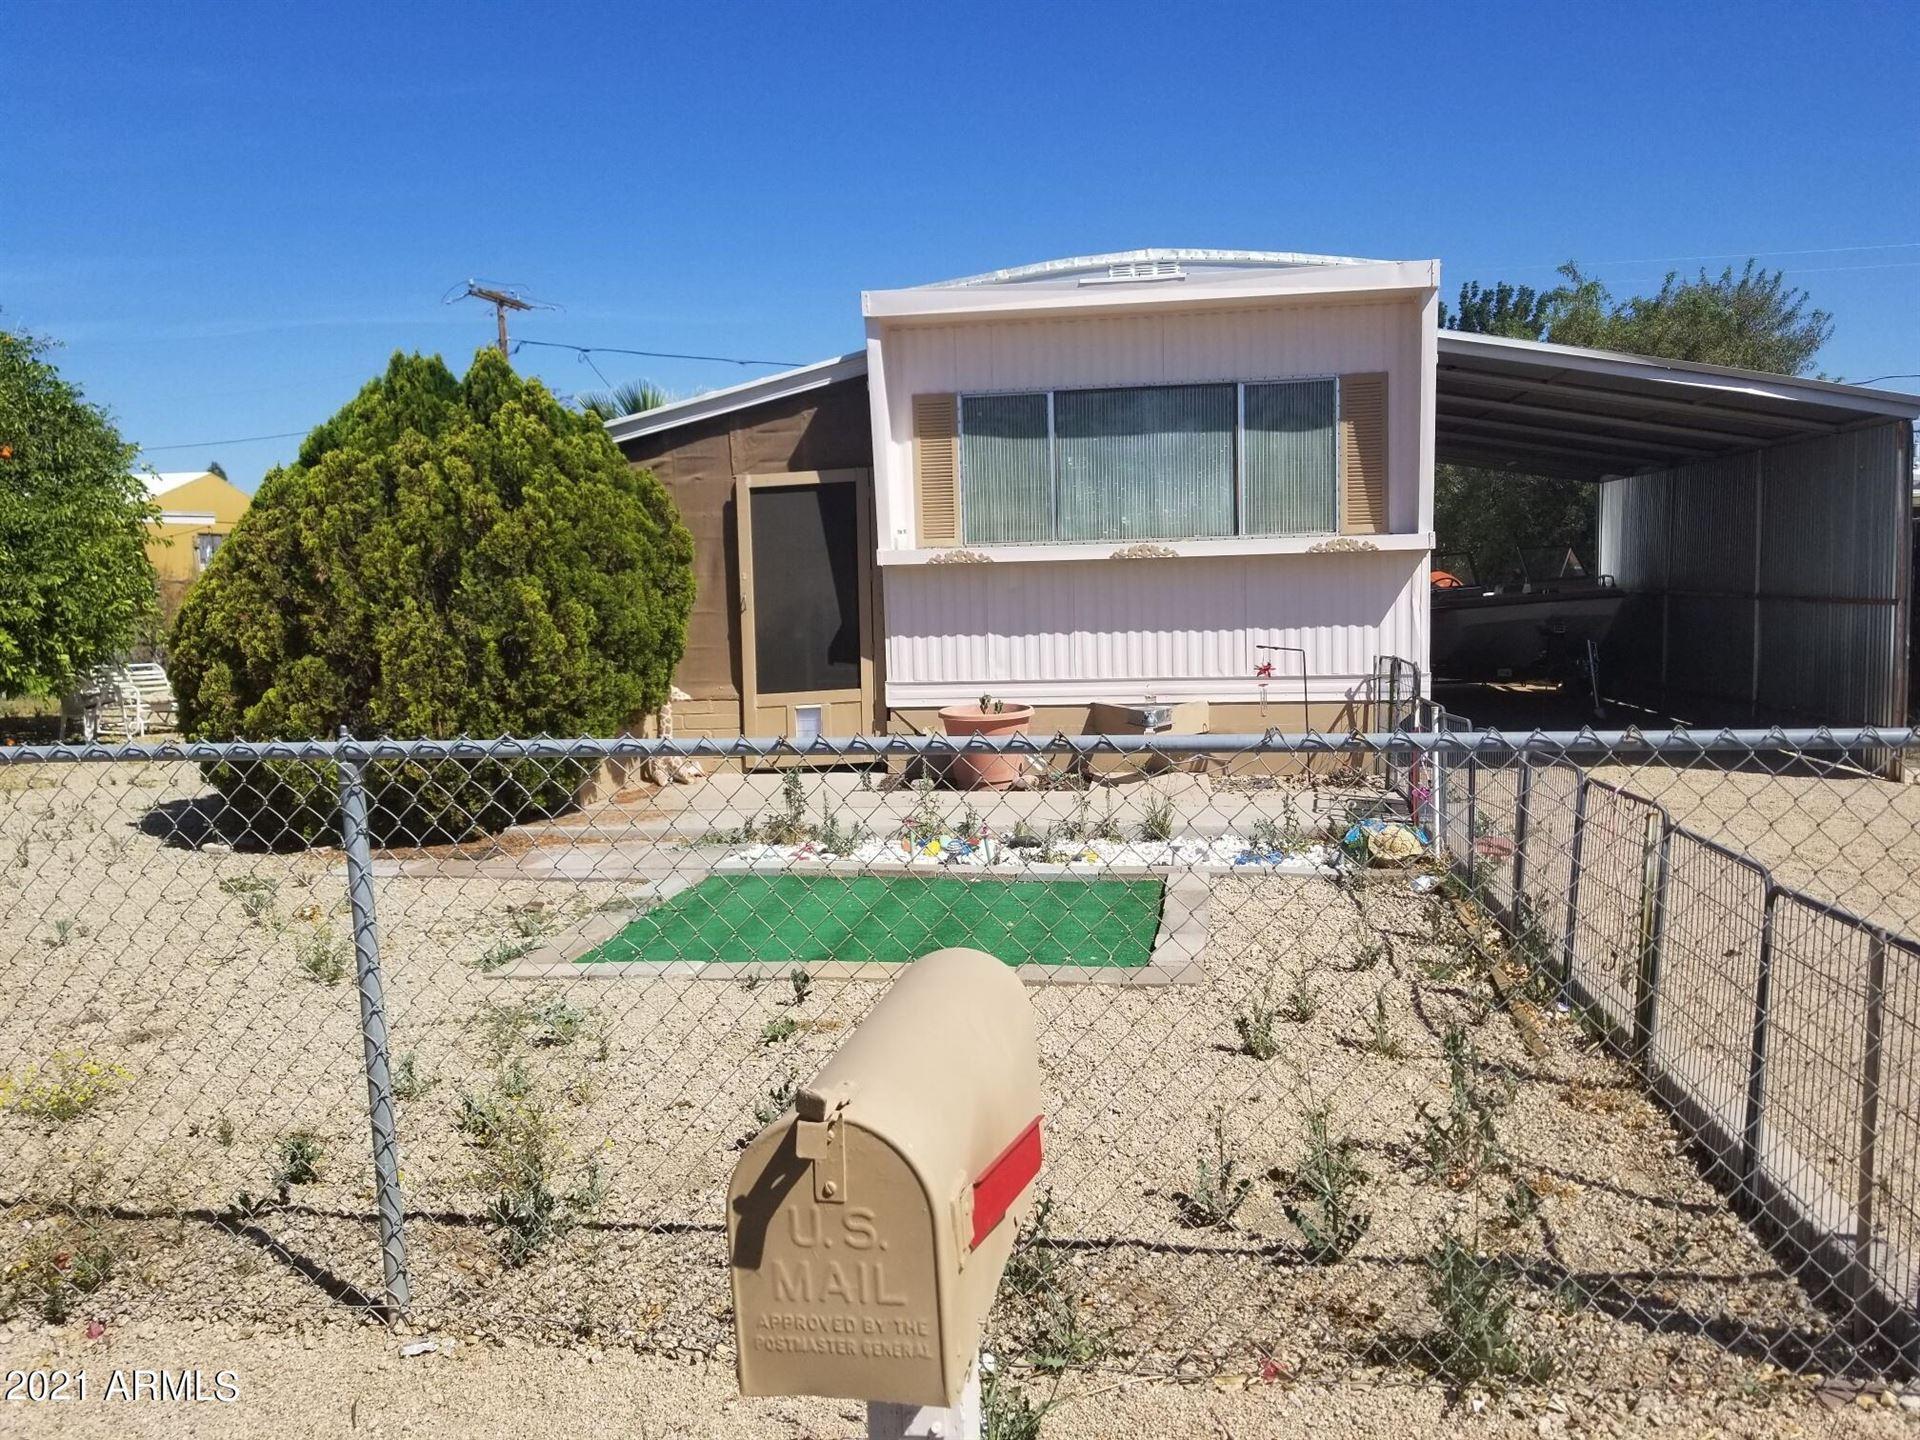 2608 E AIRE LIBRE Avenue, Phoenix, AZ 85032 - MLS#: 6224178